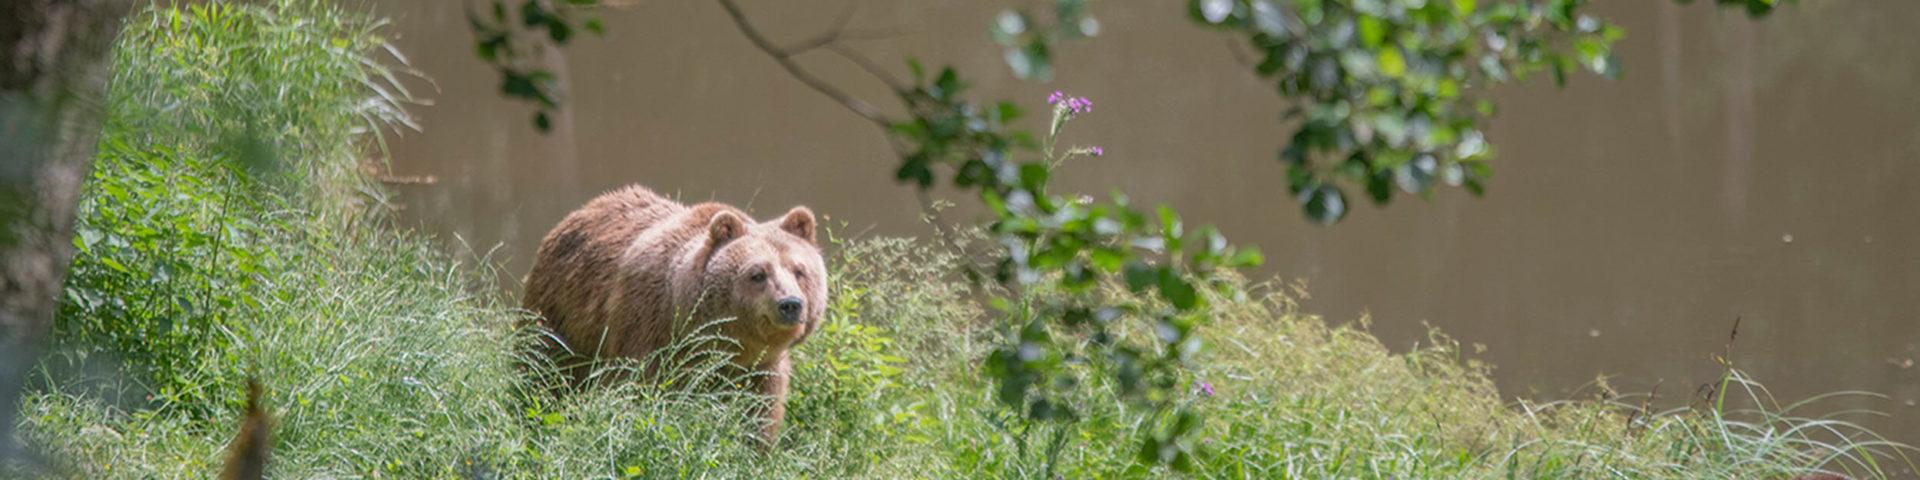 bear-sanctuary